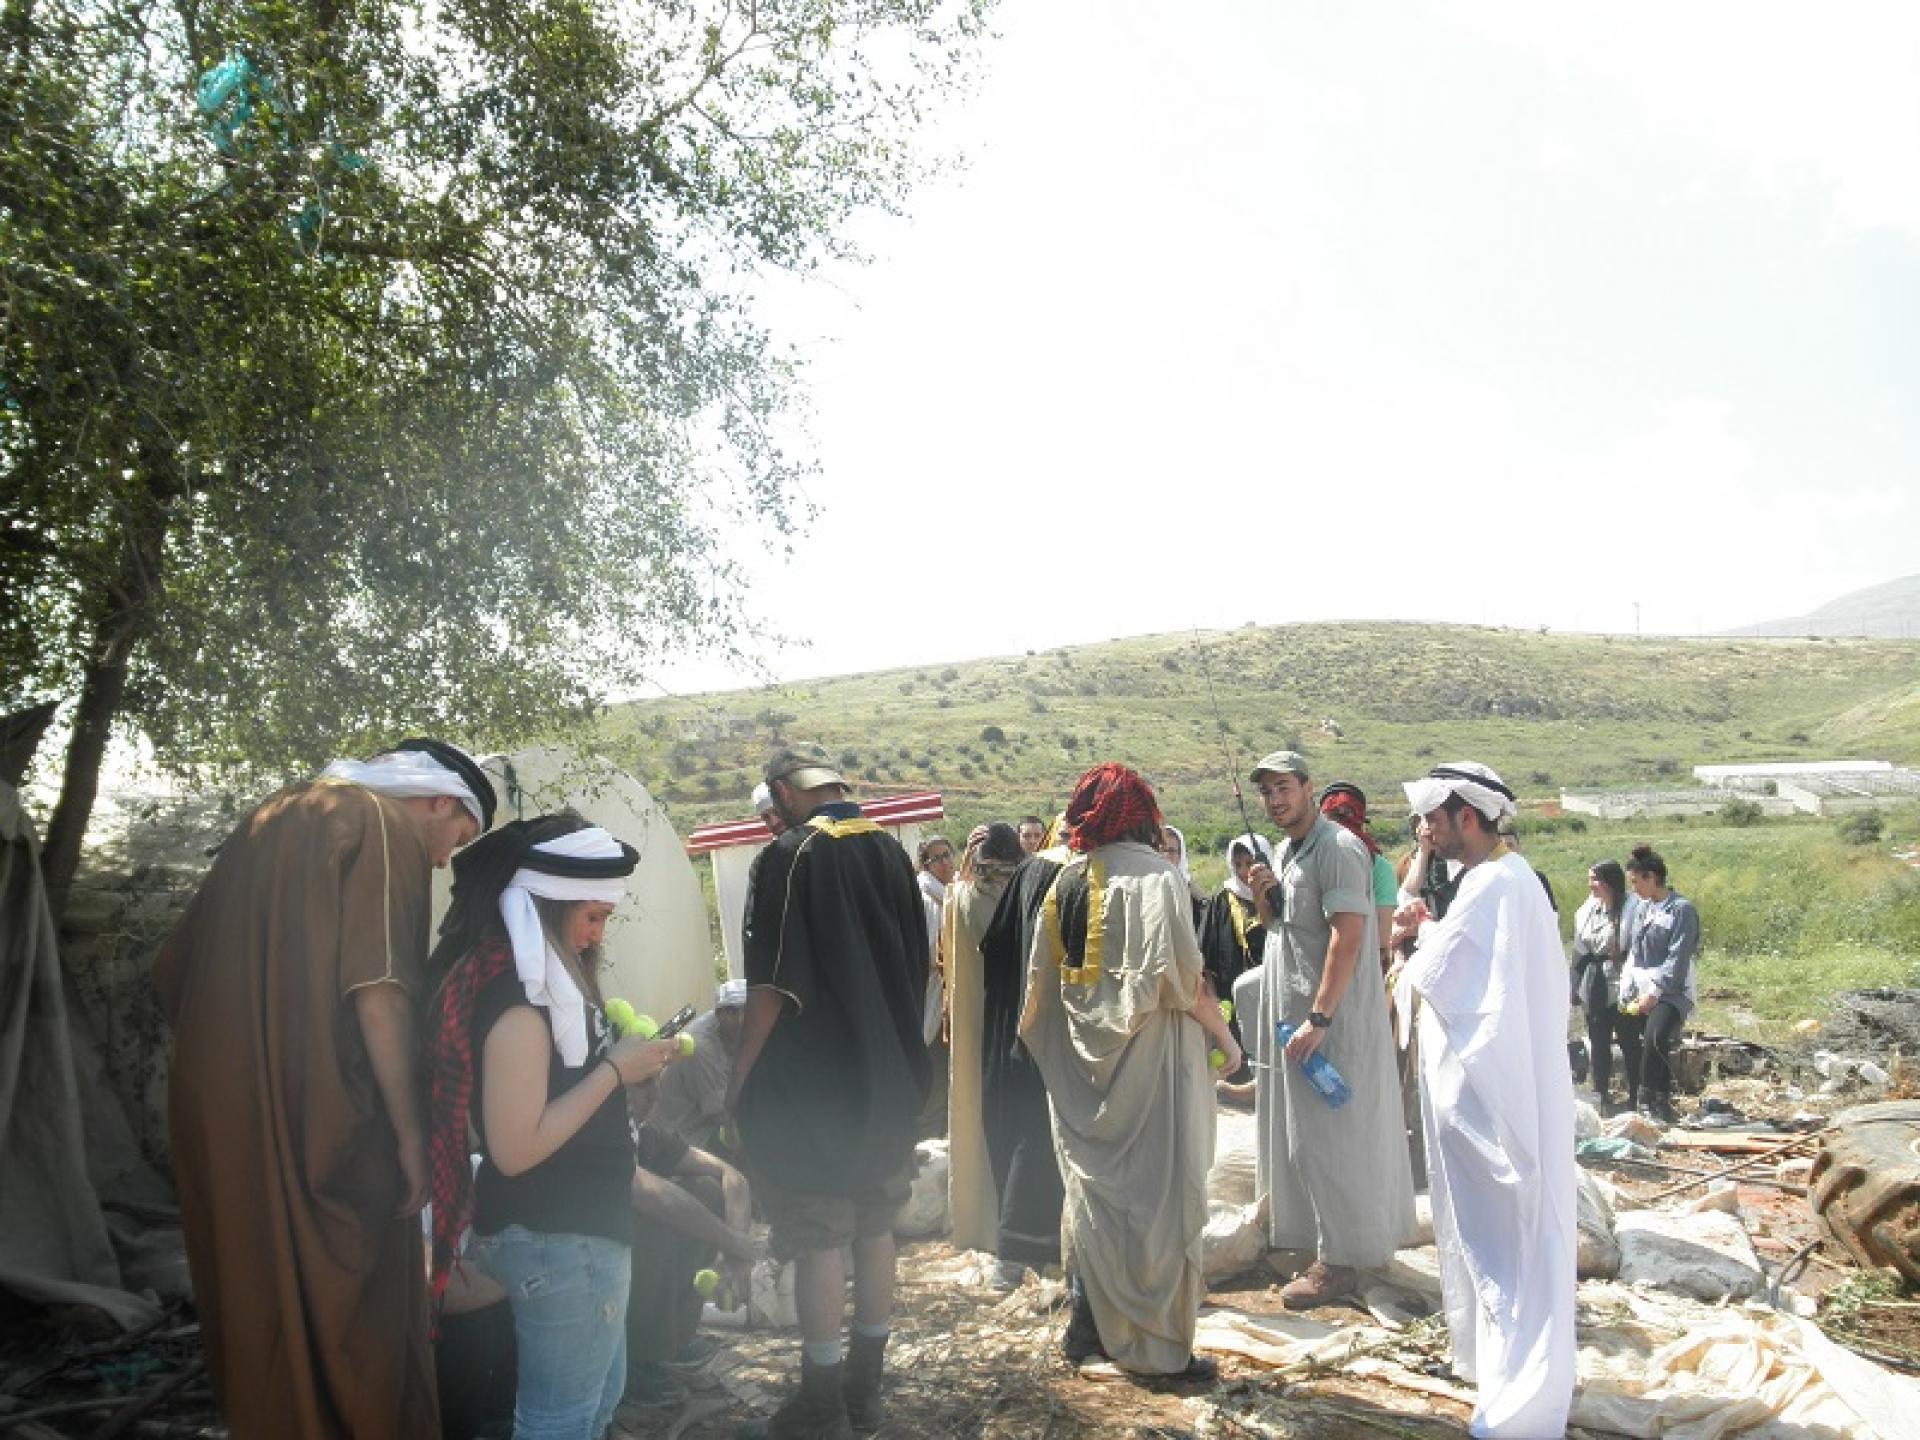 31.3.15 Hamra, Jordan Valley חמרה, בקעת הירדן